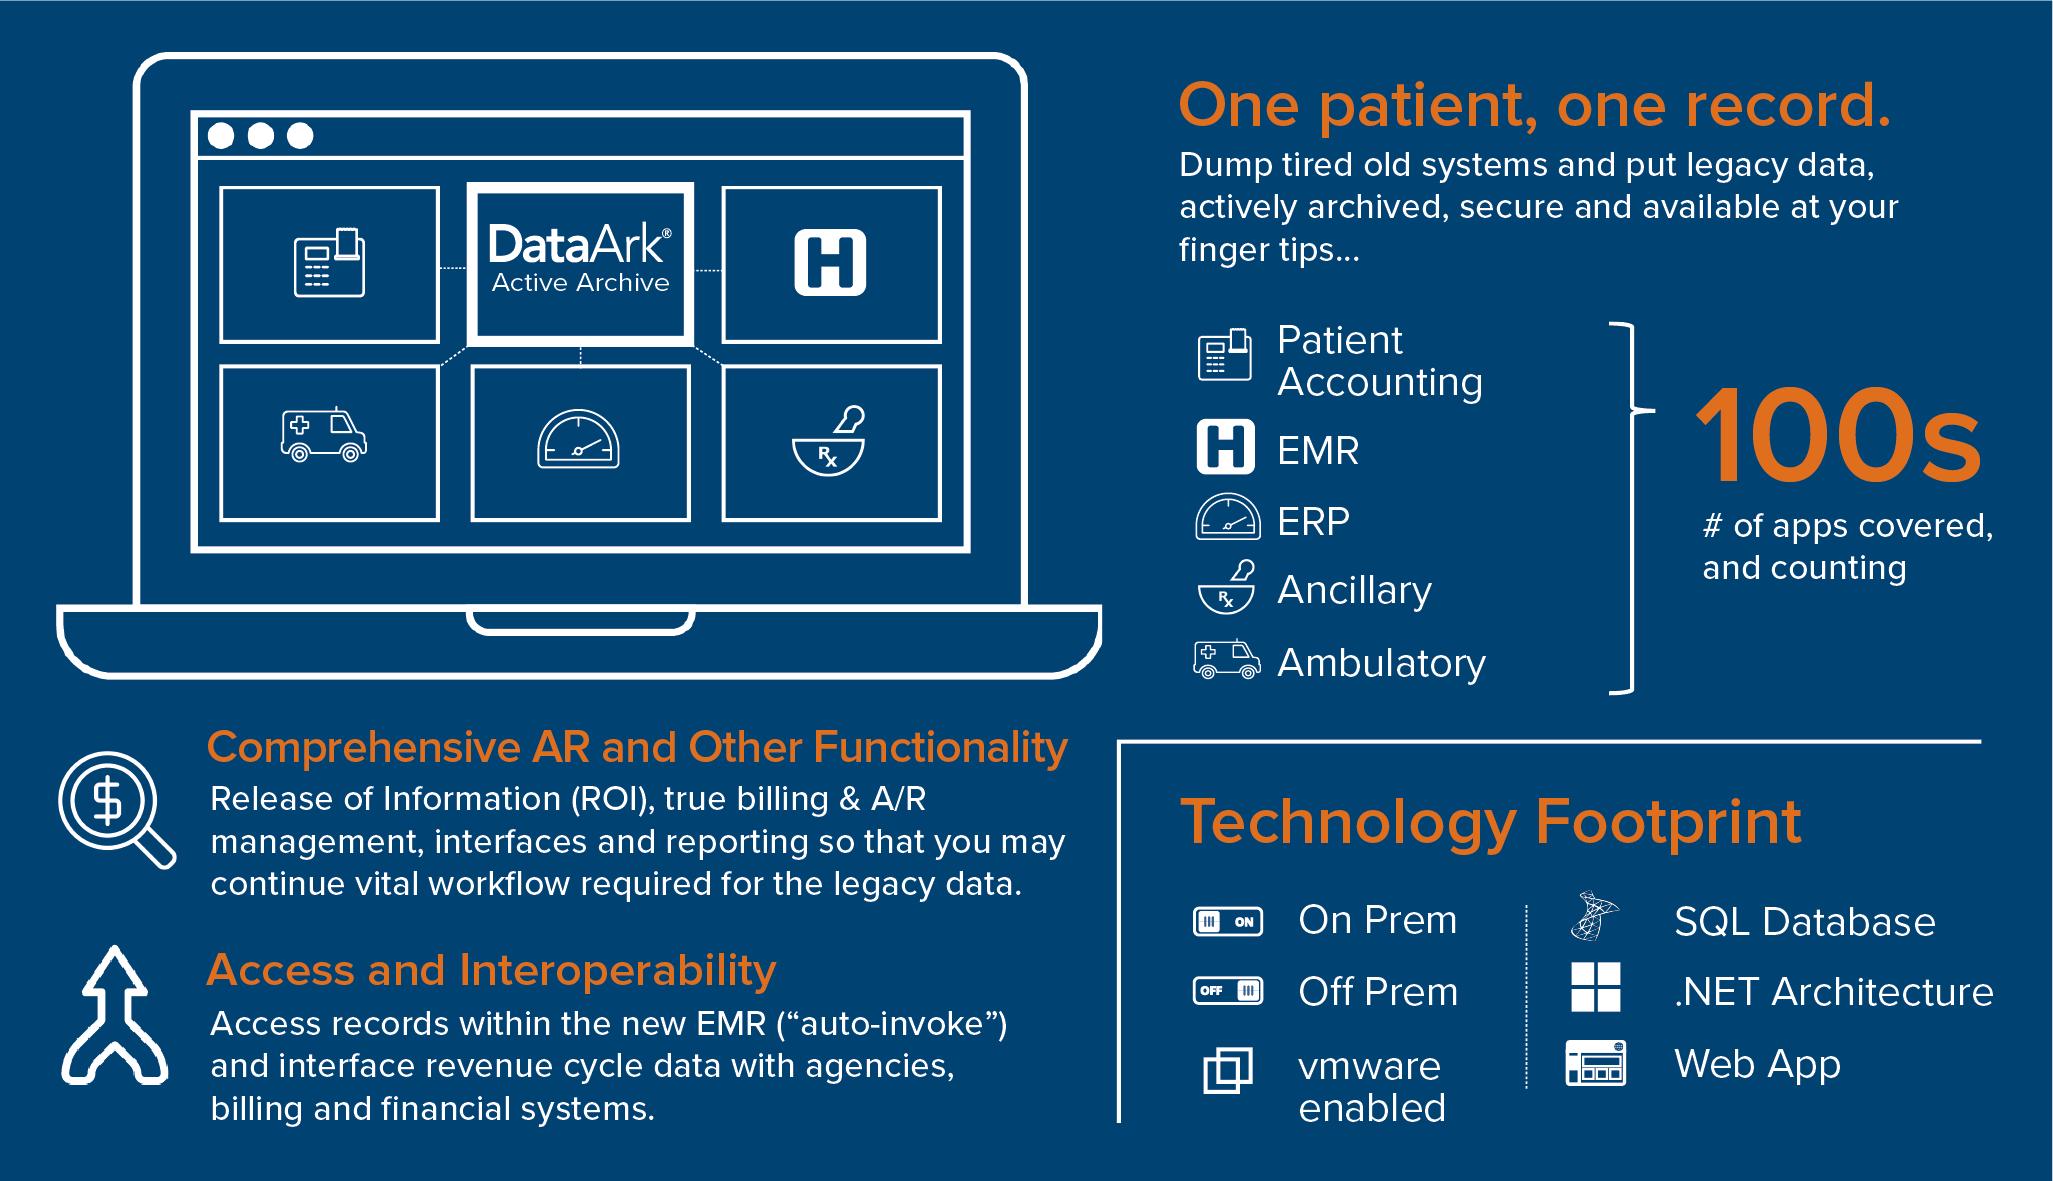 DataArk Infographic.png